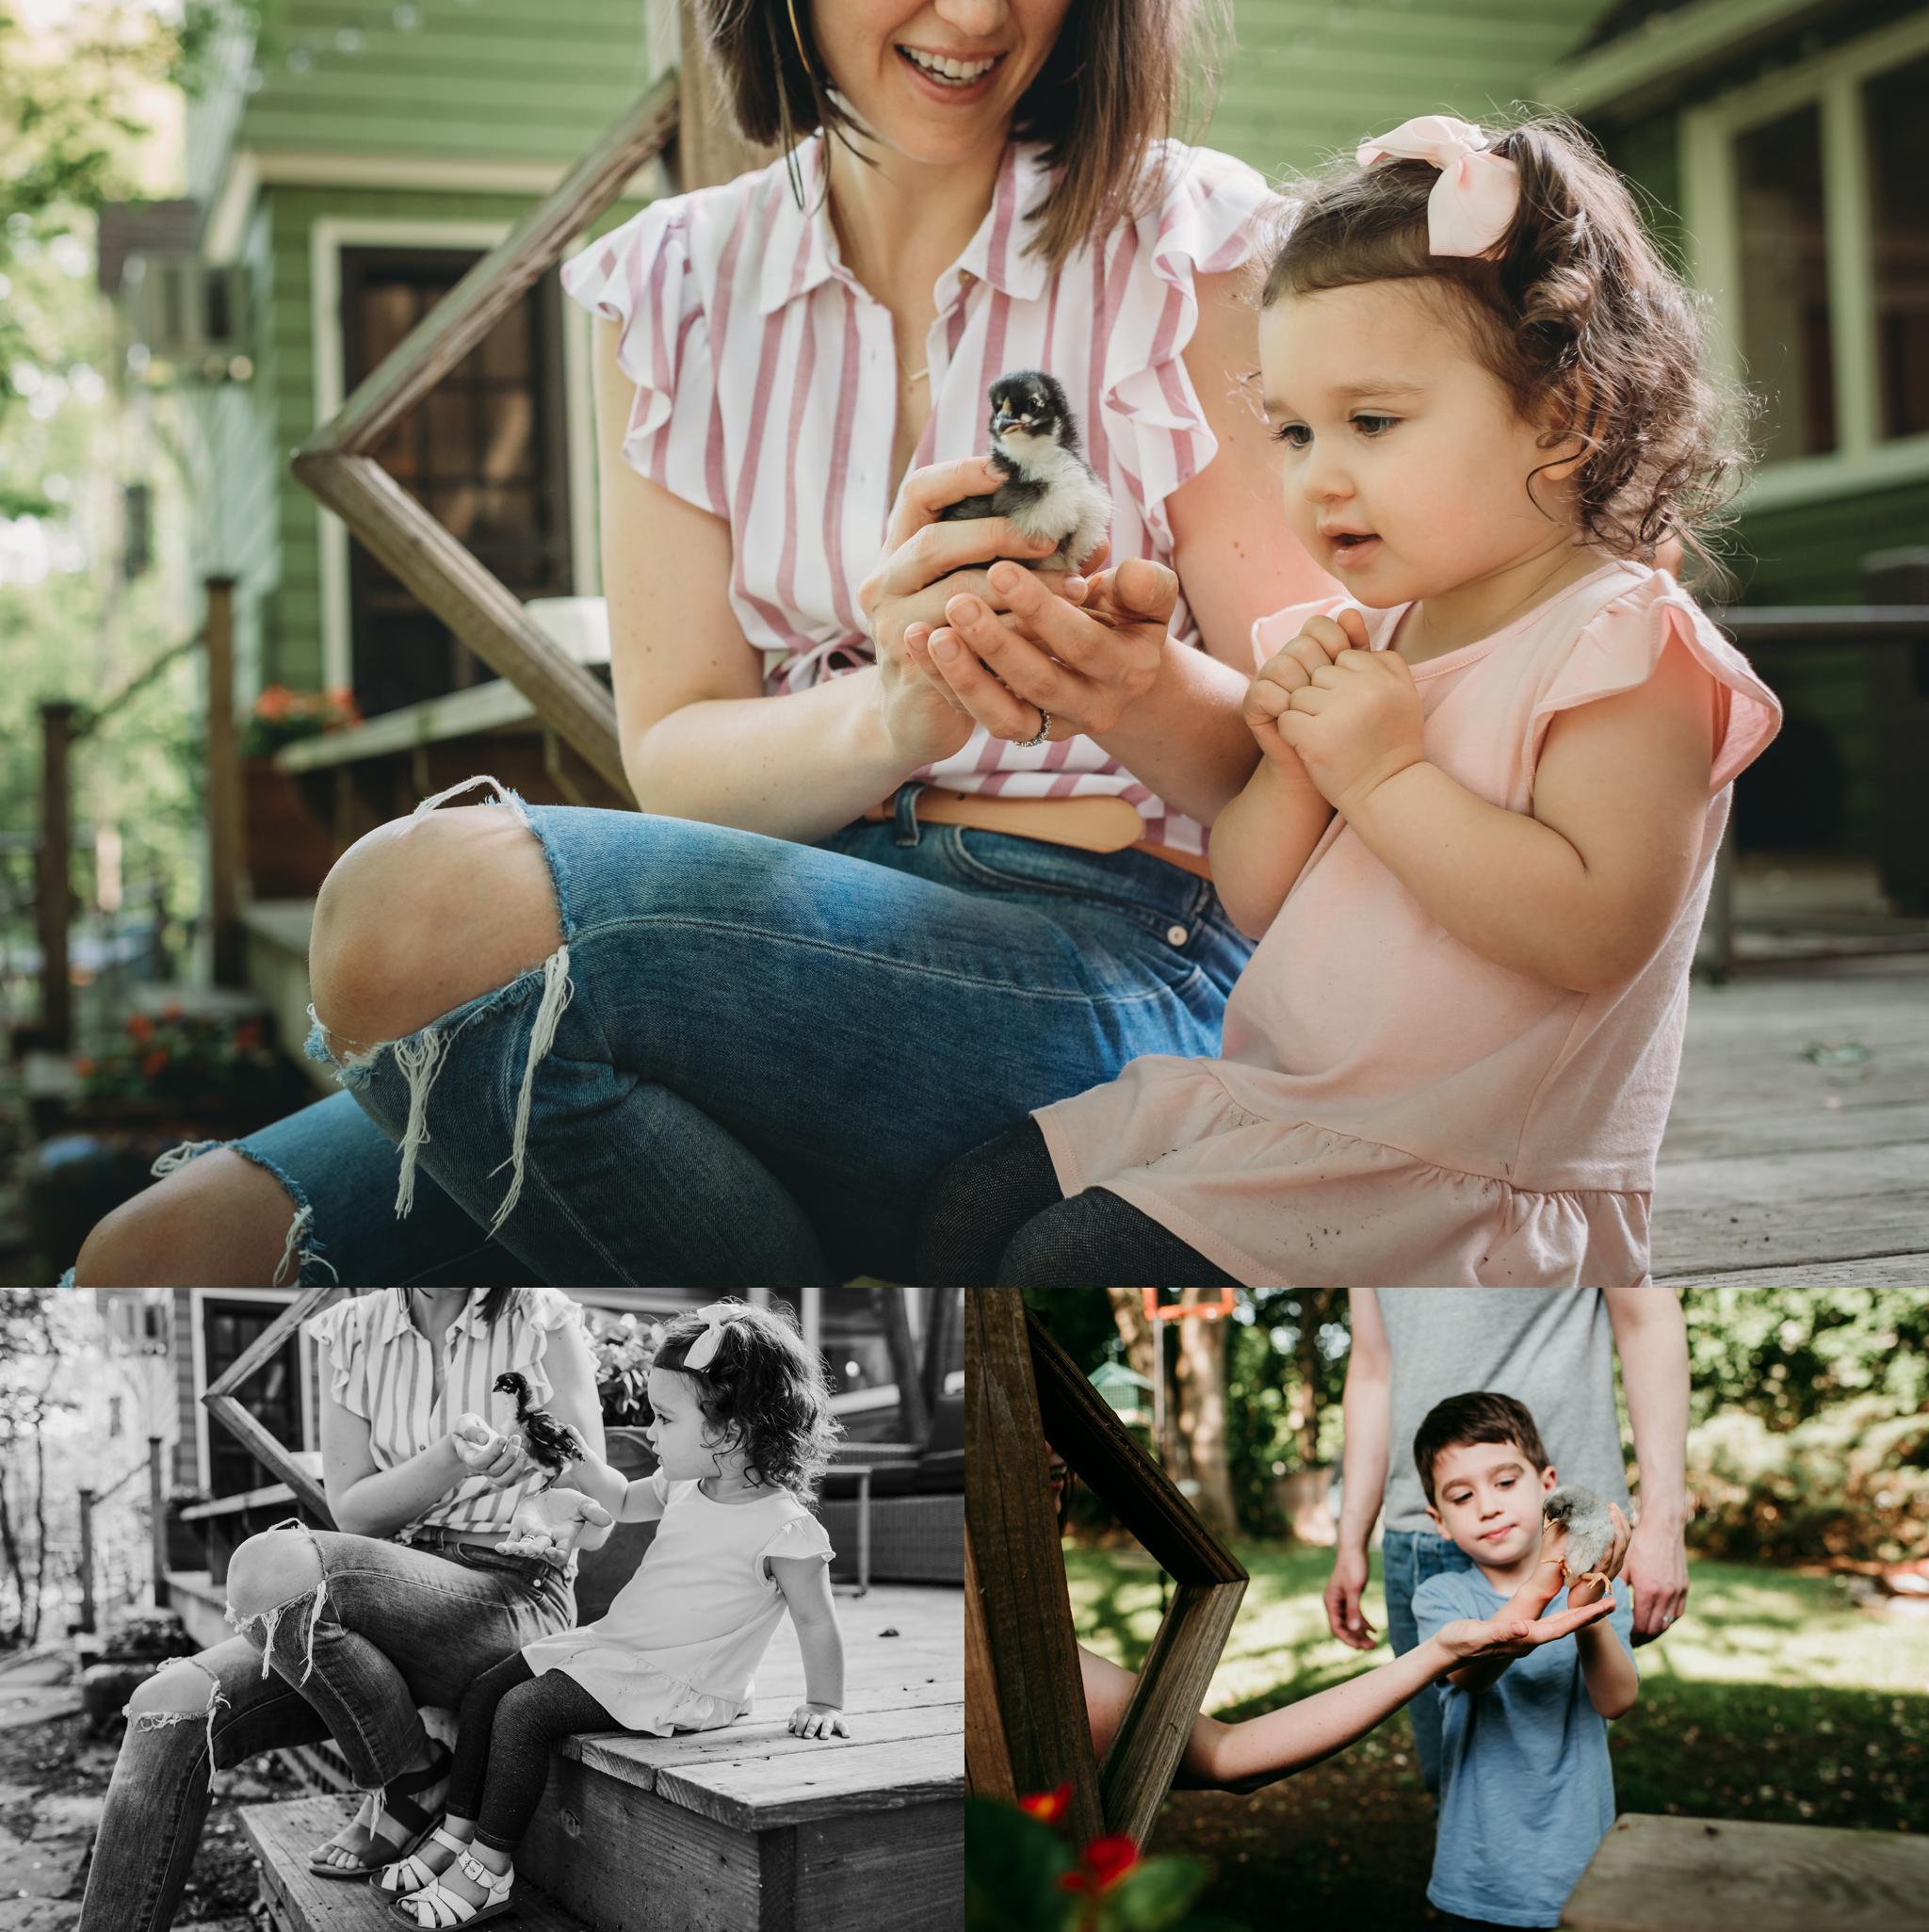 amy-drucker-lifestyle-family-photography-2.jpg